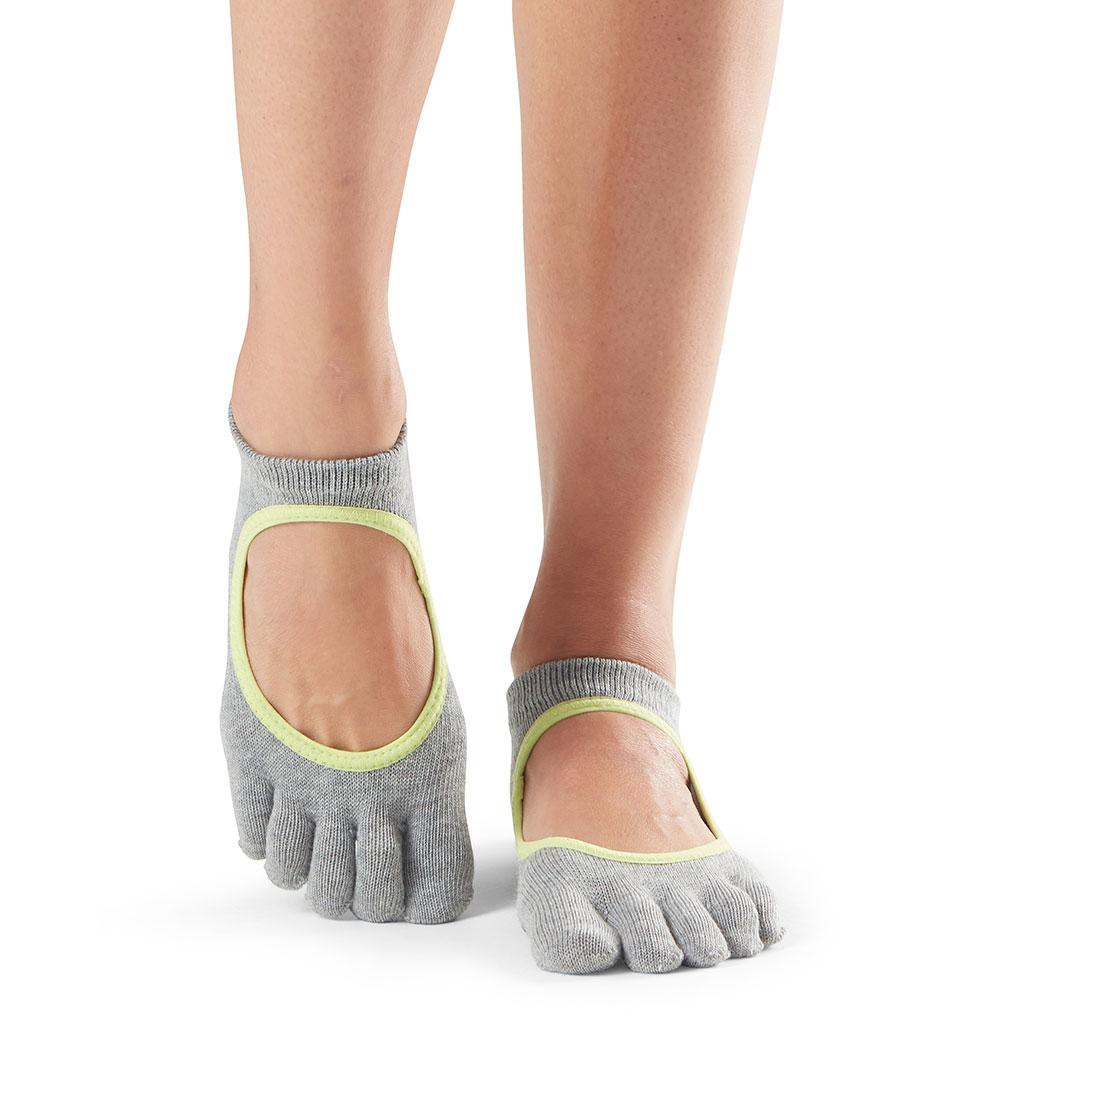 Yogasocken ToeSox Bellarina Full Toe Heather Grey with Lime Trim - 1